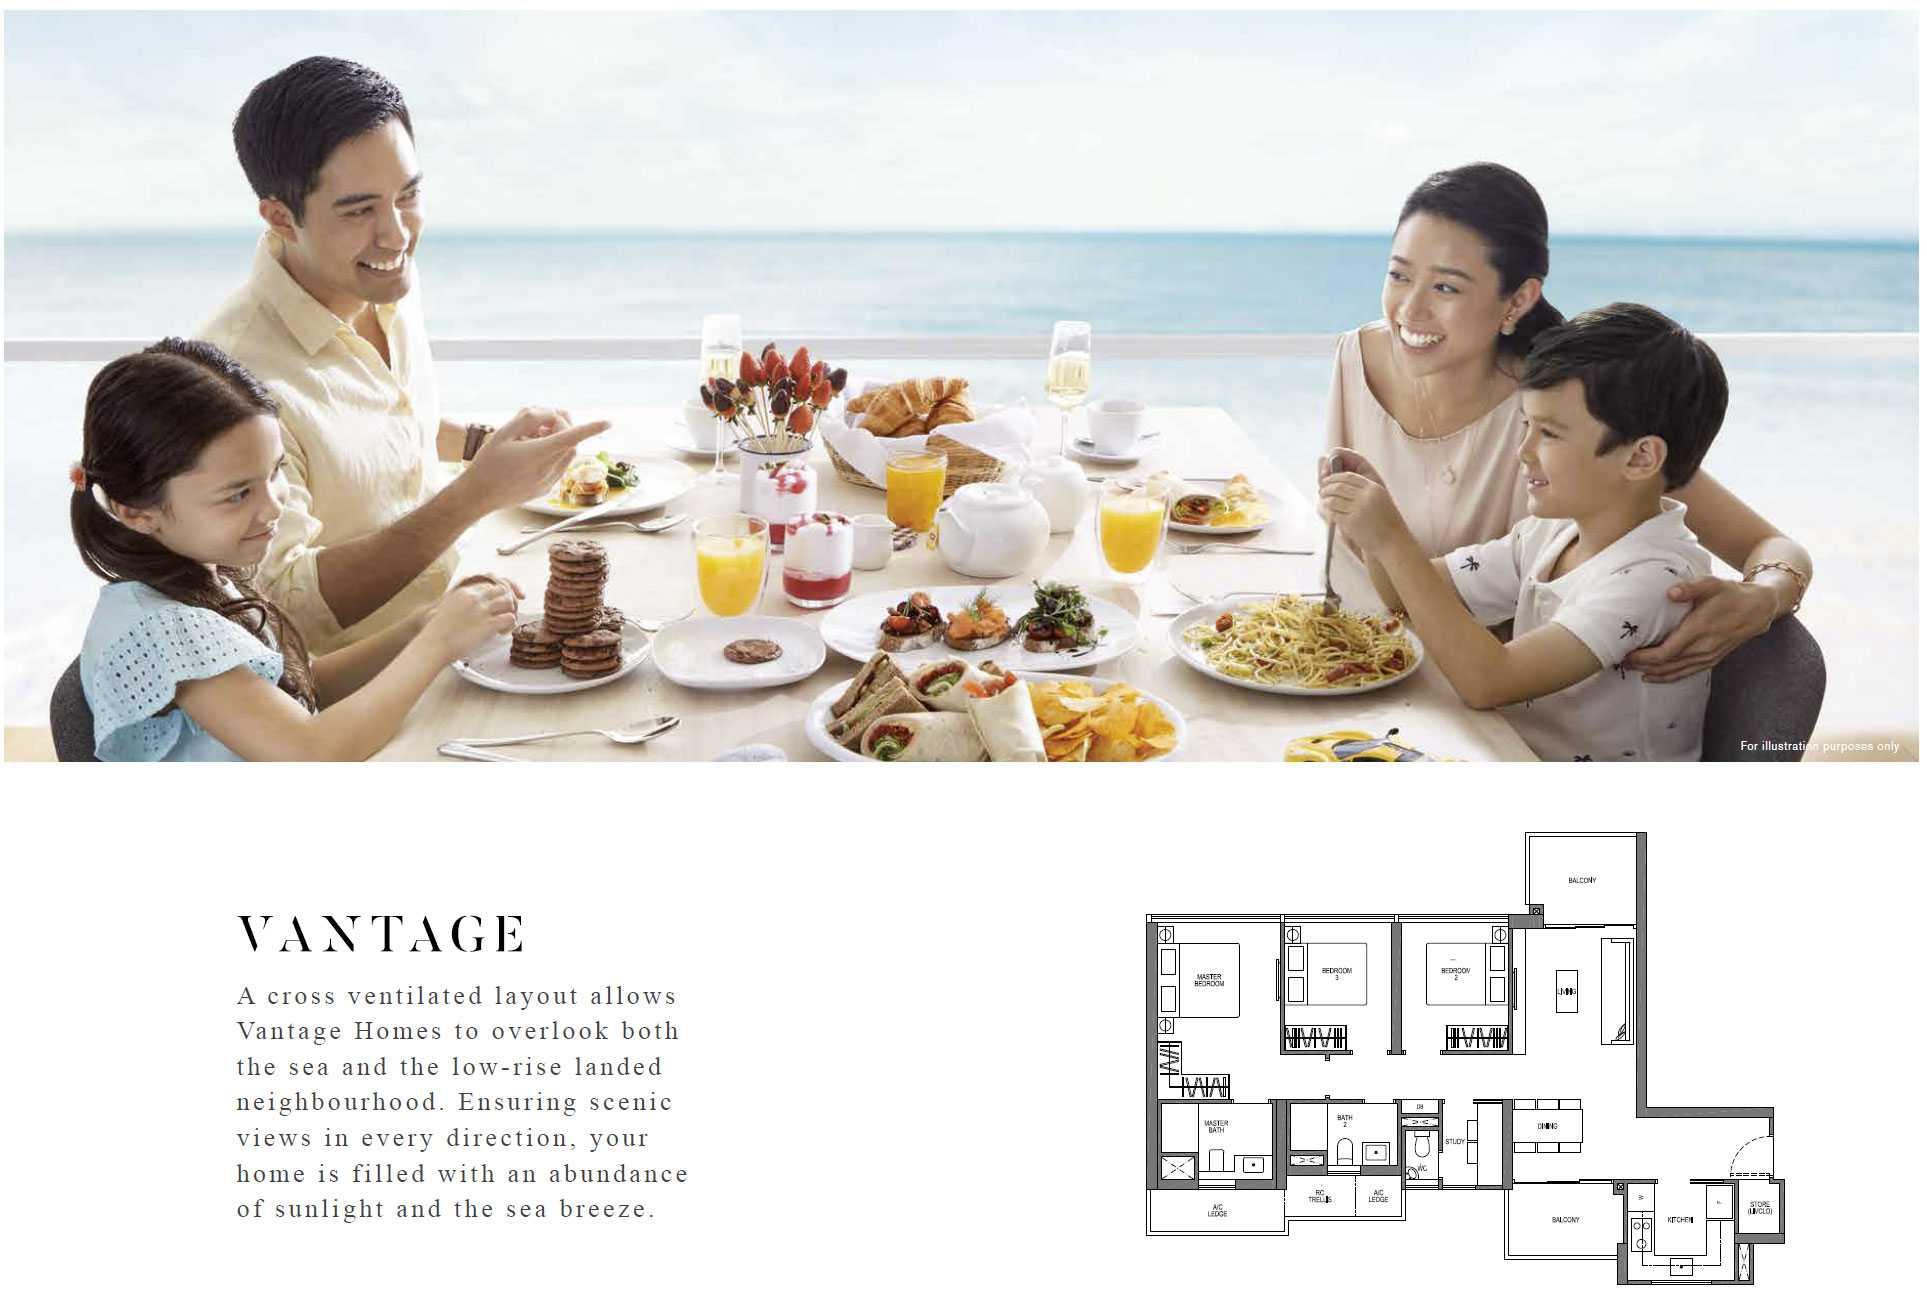 seaside-residences-vantage